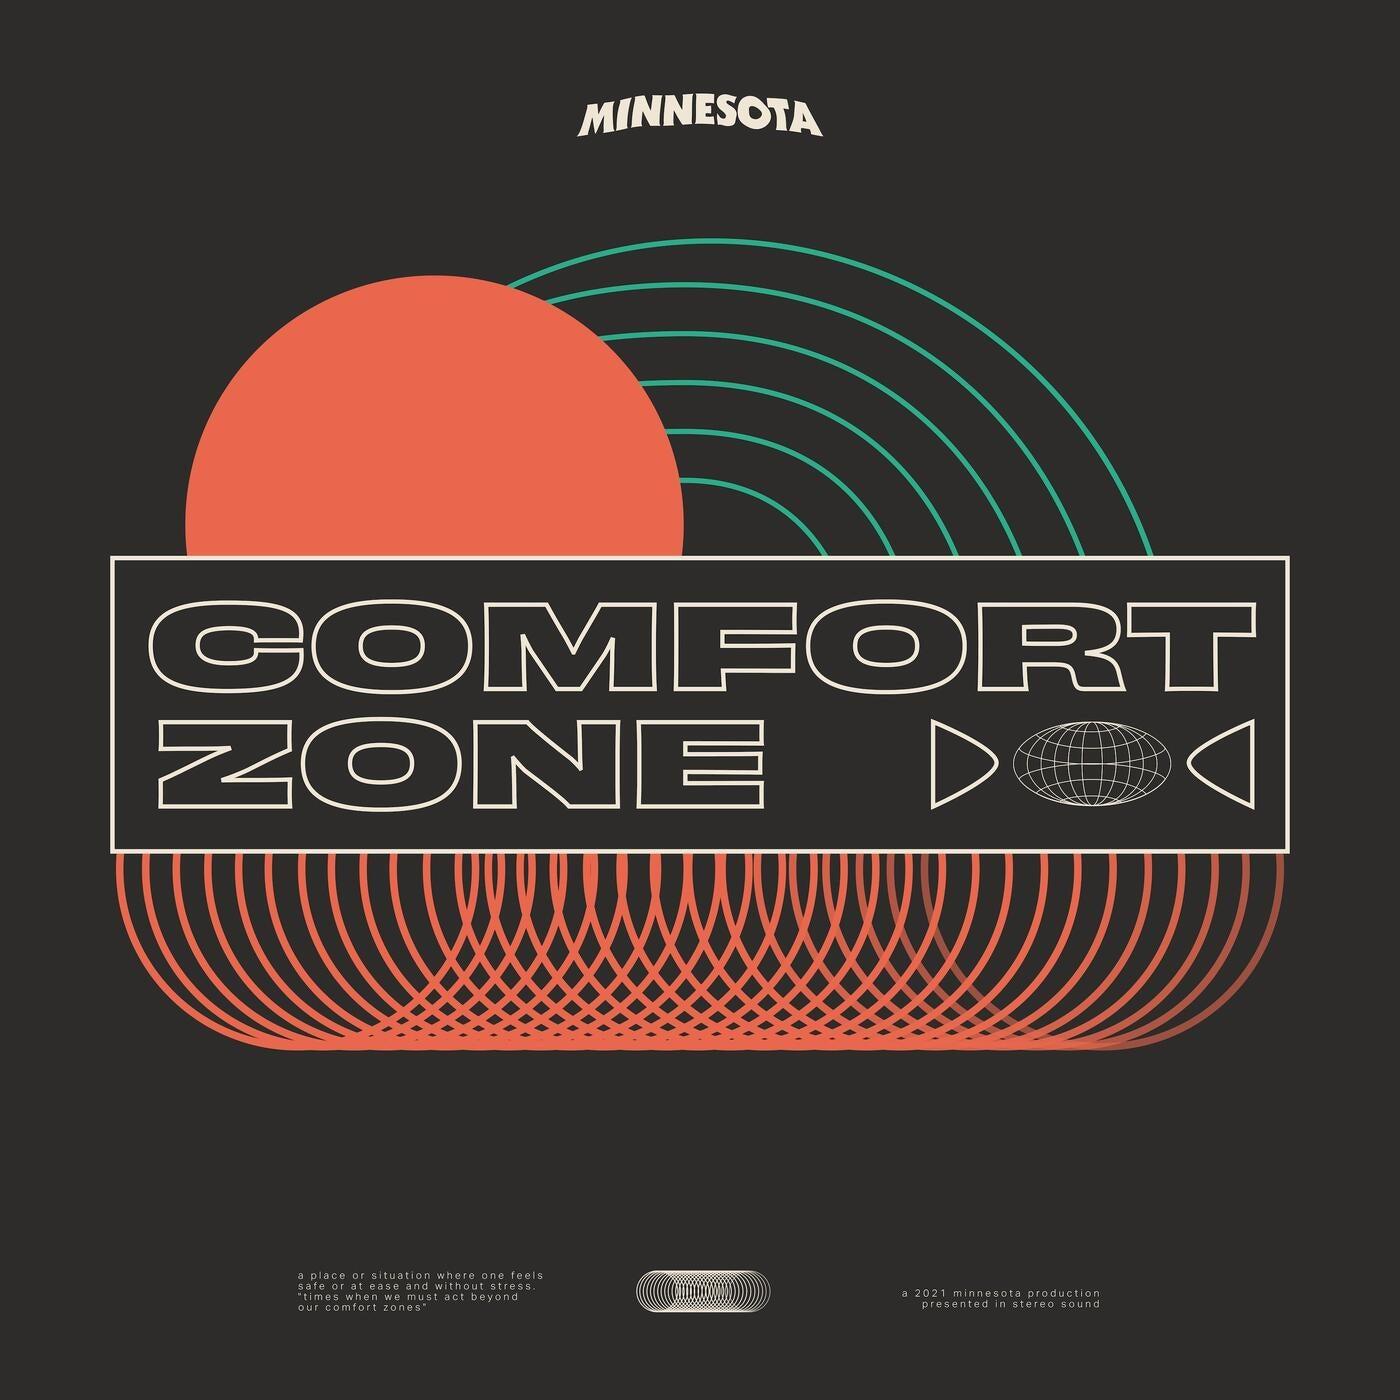 Comfort Zone (Original Mix)